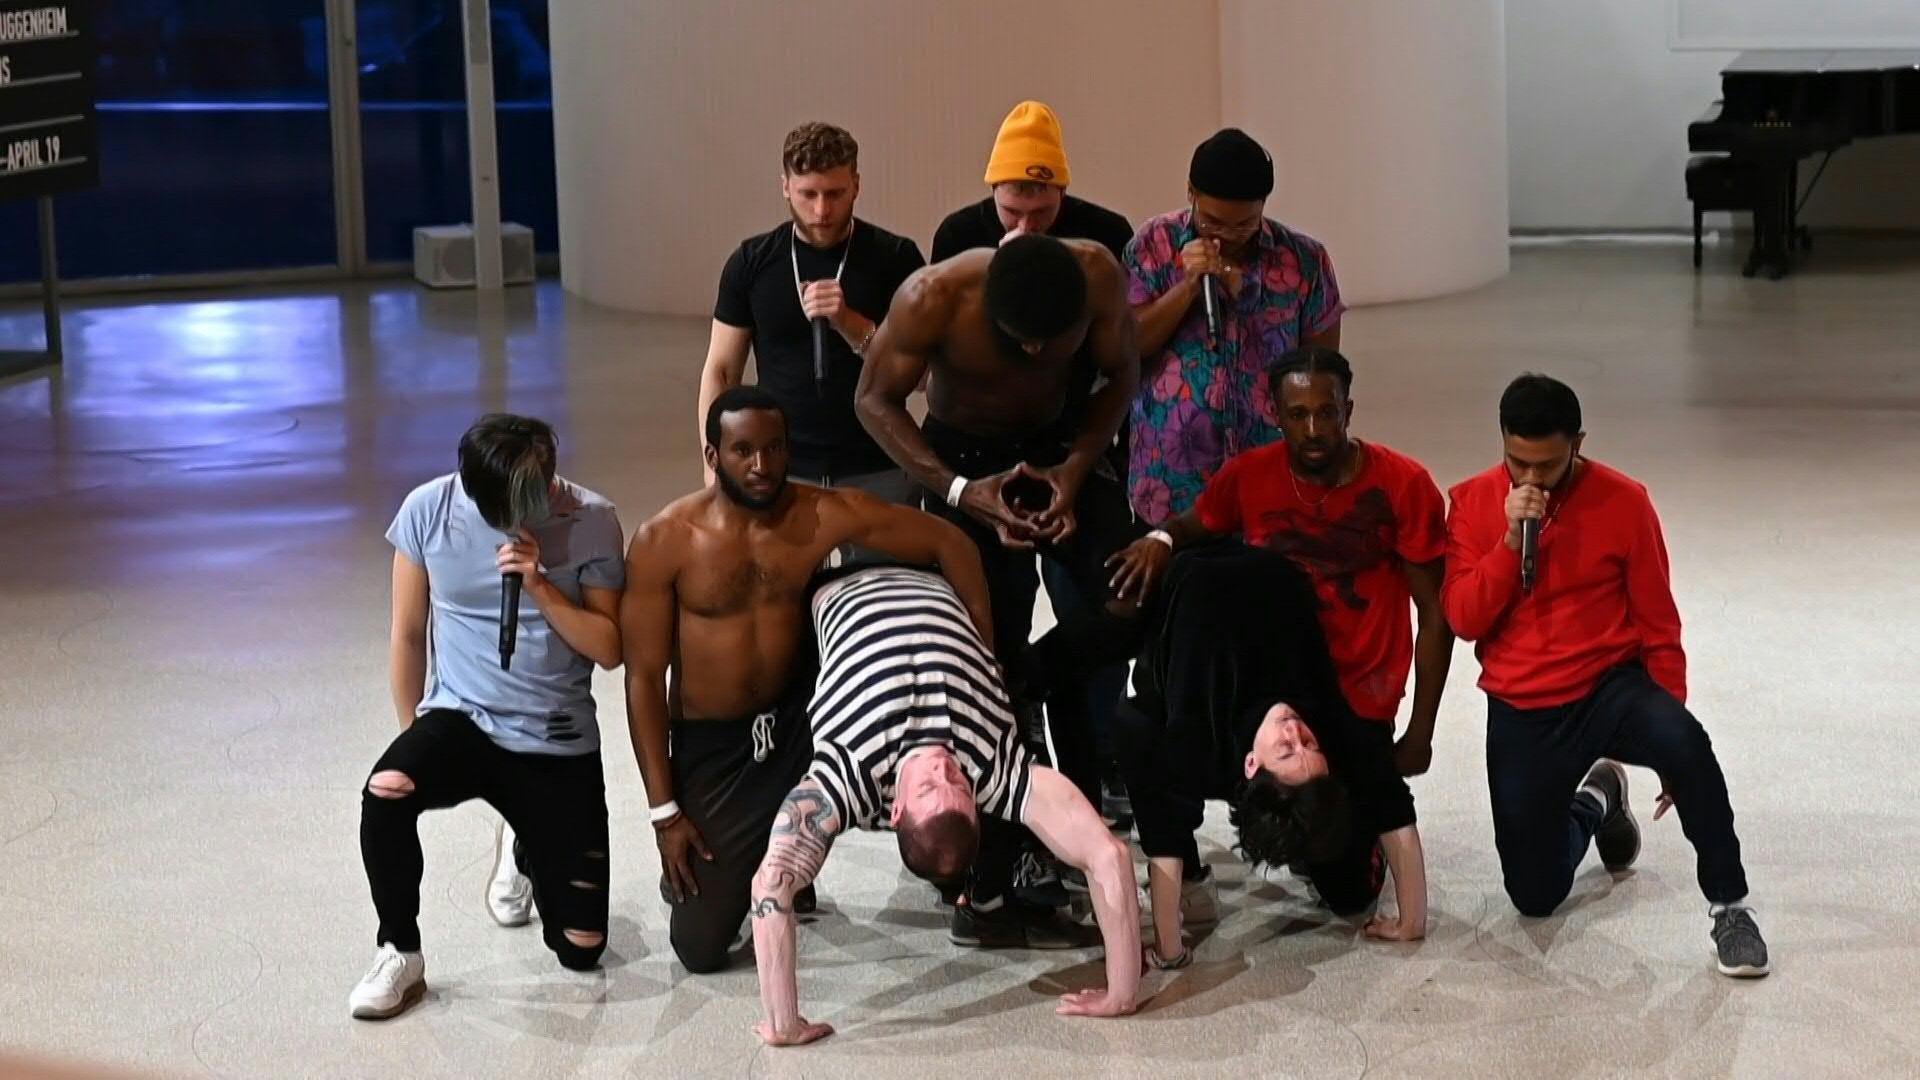 news.yahoo.com: New York's Guggenheim Museum hosts pop-up hip hop performance